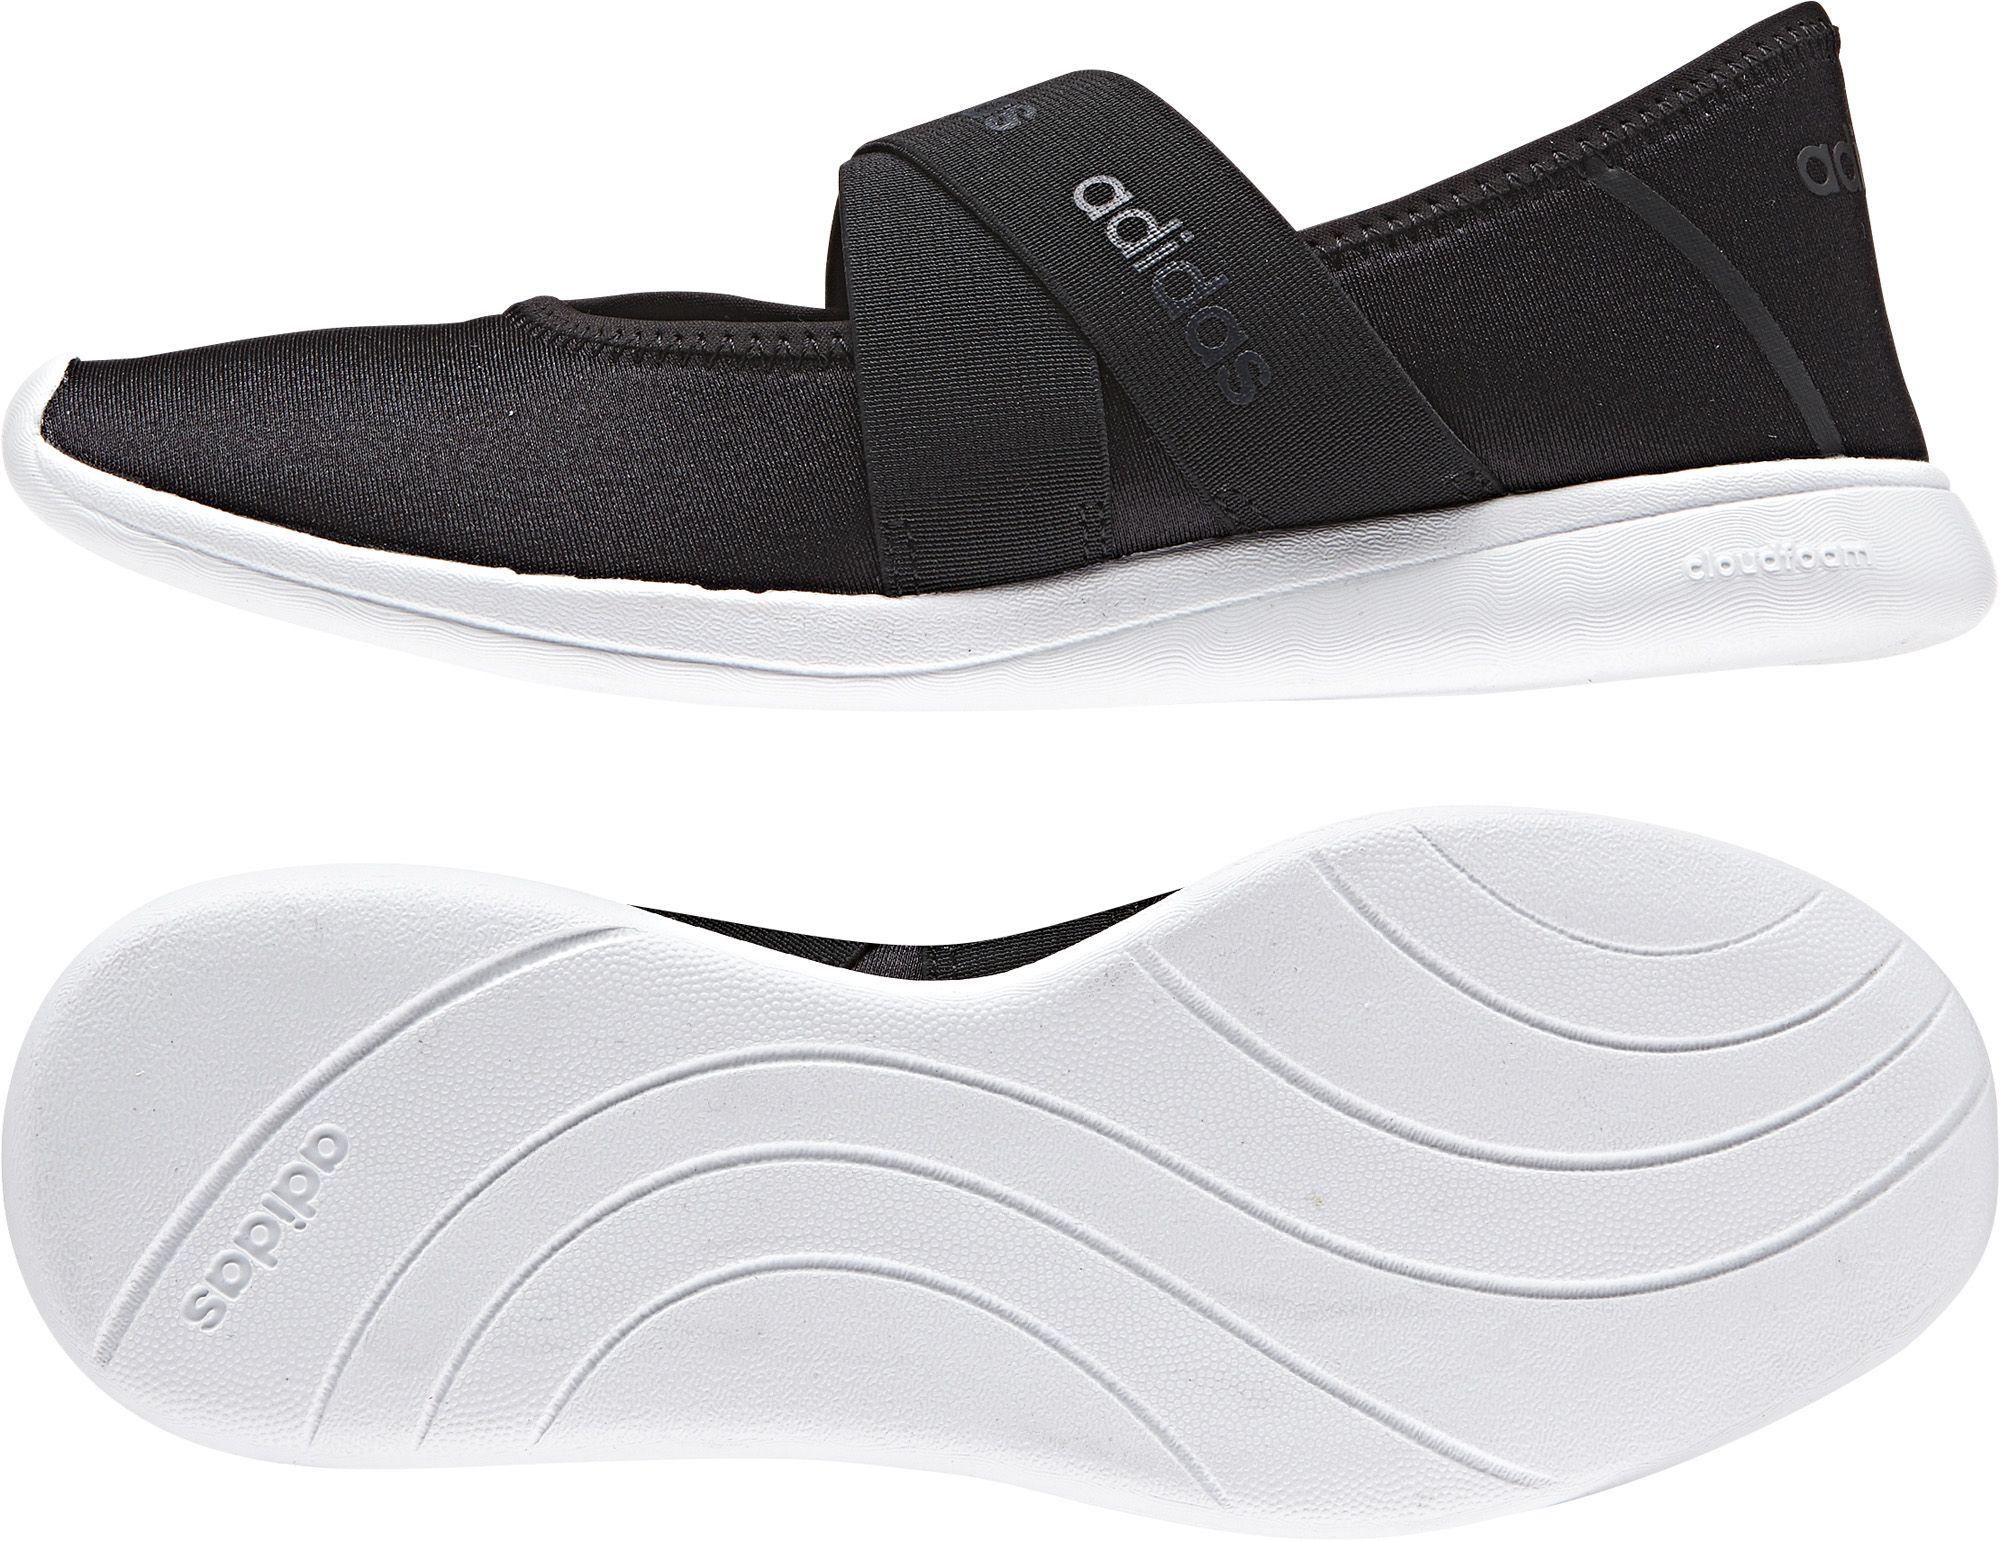 Fingerhut - adidas Neo Women's Cloudfoam Pure Mary Jane Shoes